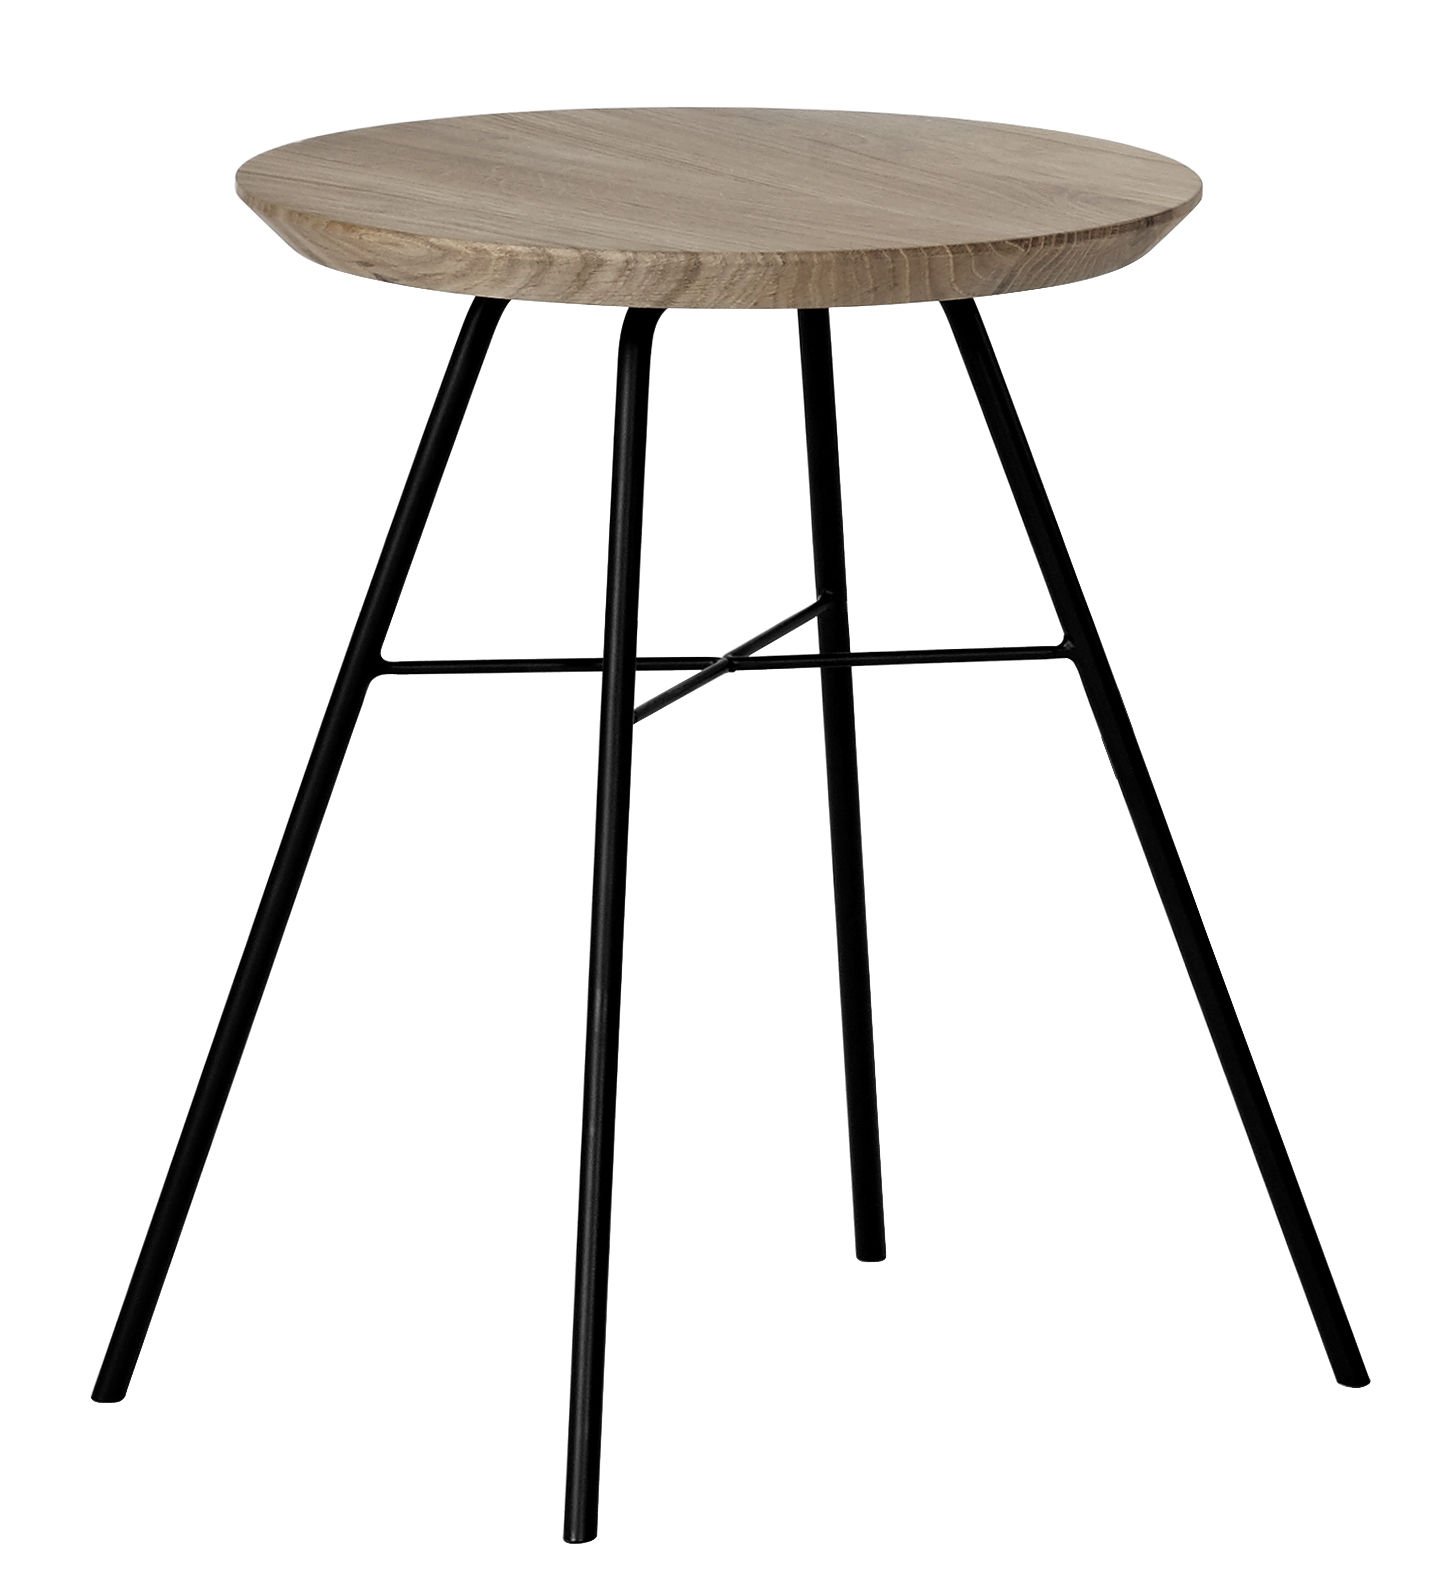 Disc stool wood metal h cm natural oak black by